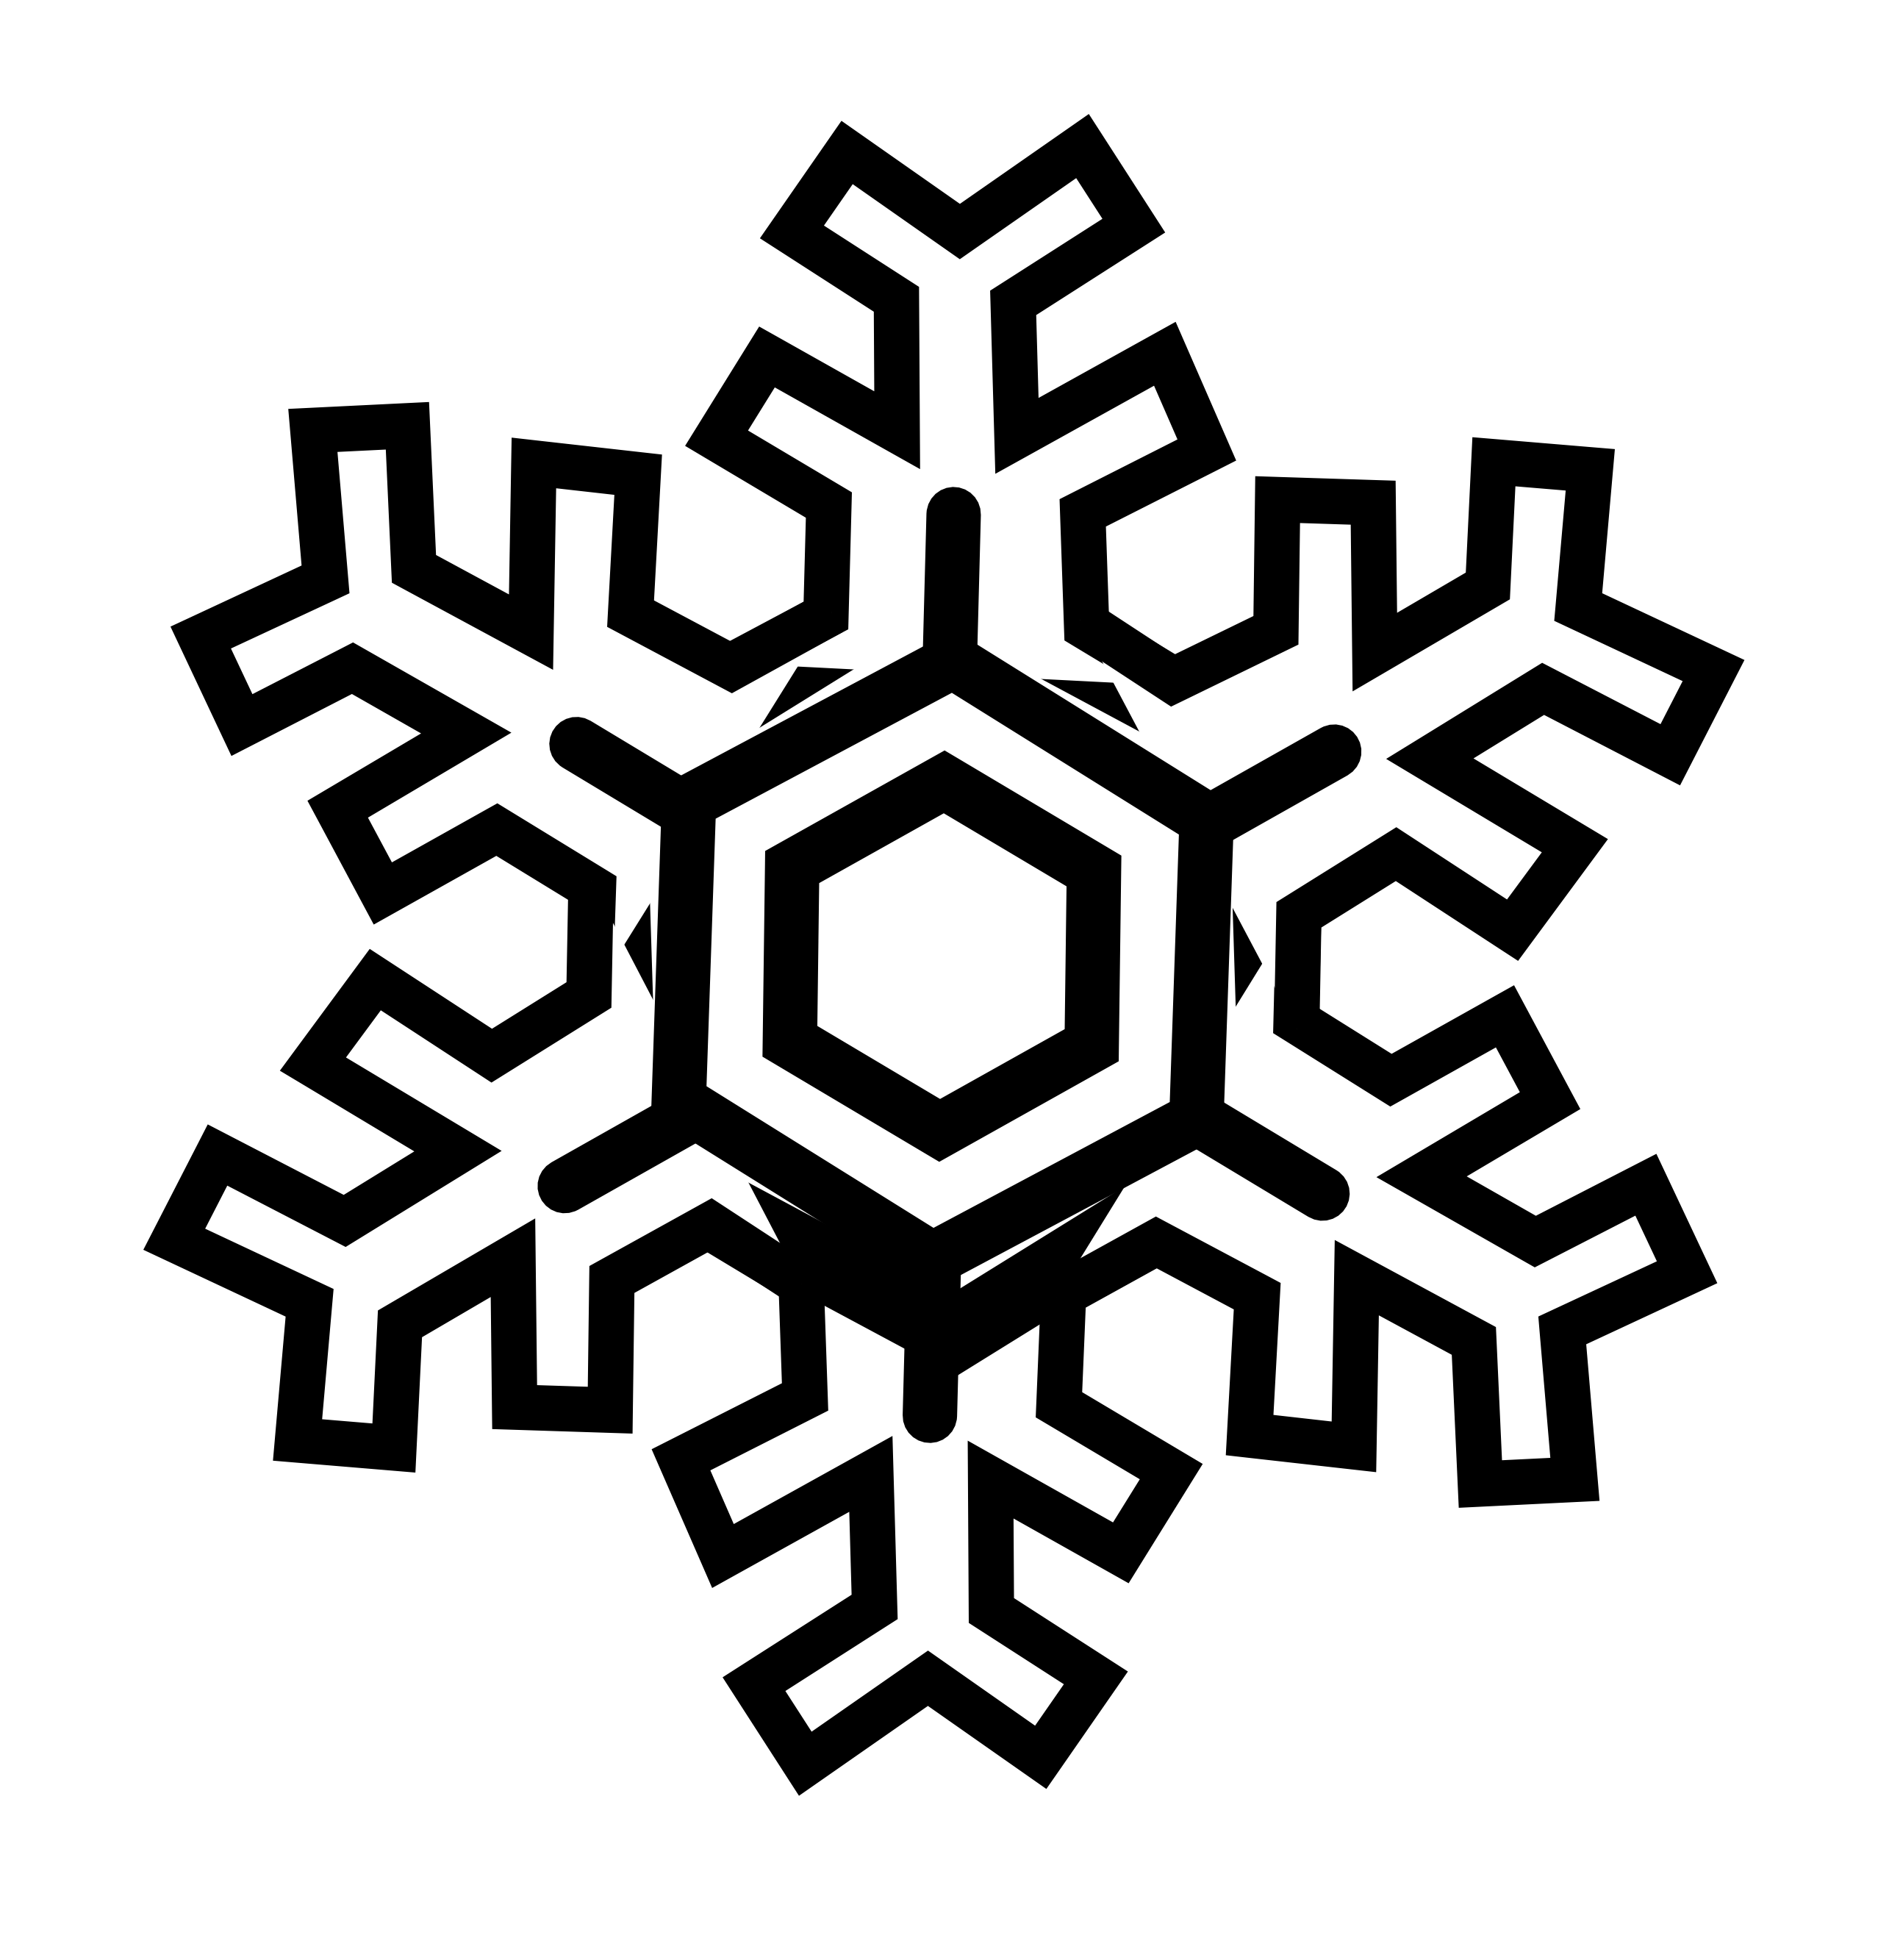 Snowman  black and white snowflake clipart black and white free 2